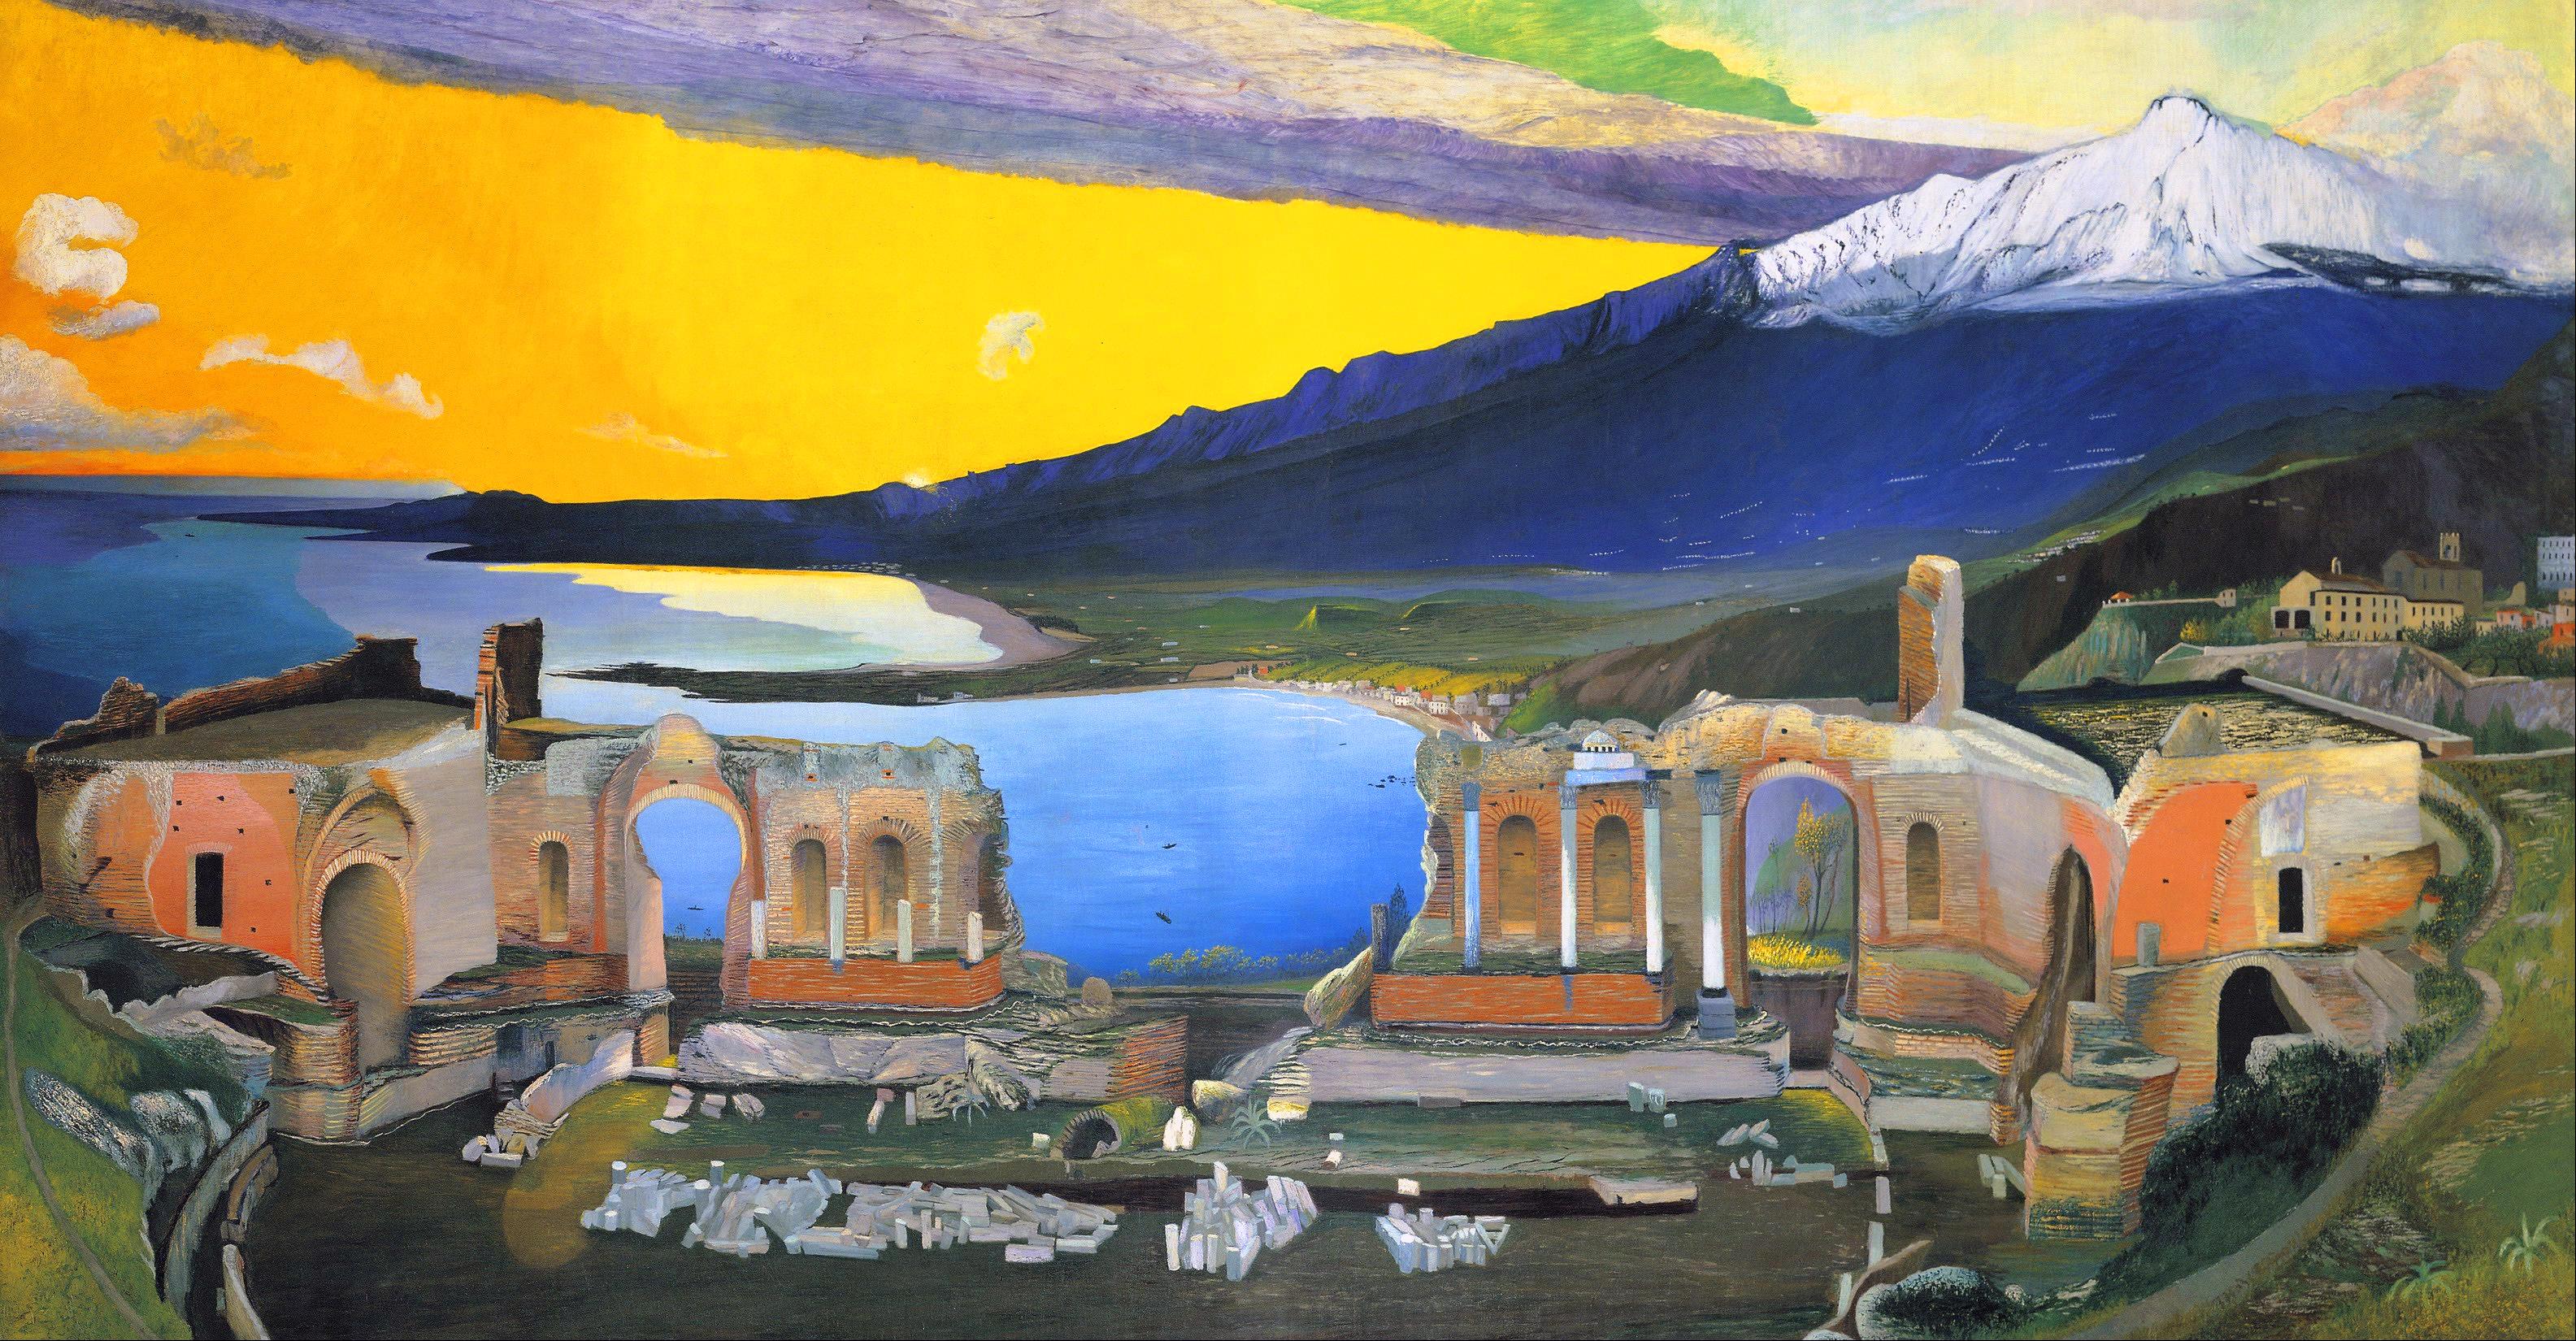 csontvary_kosztka_tivadar_-_ruins_of_the_greek_theatre_at_taormina_-_google_art_project